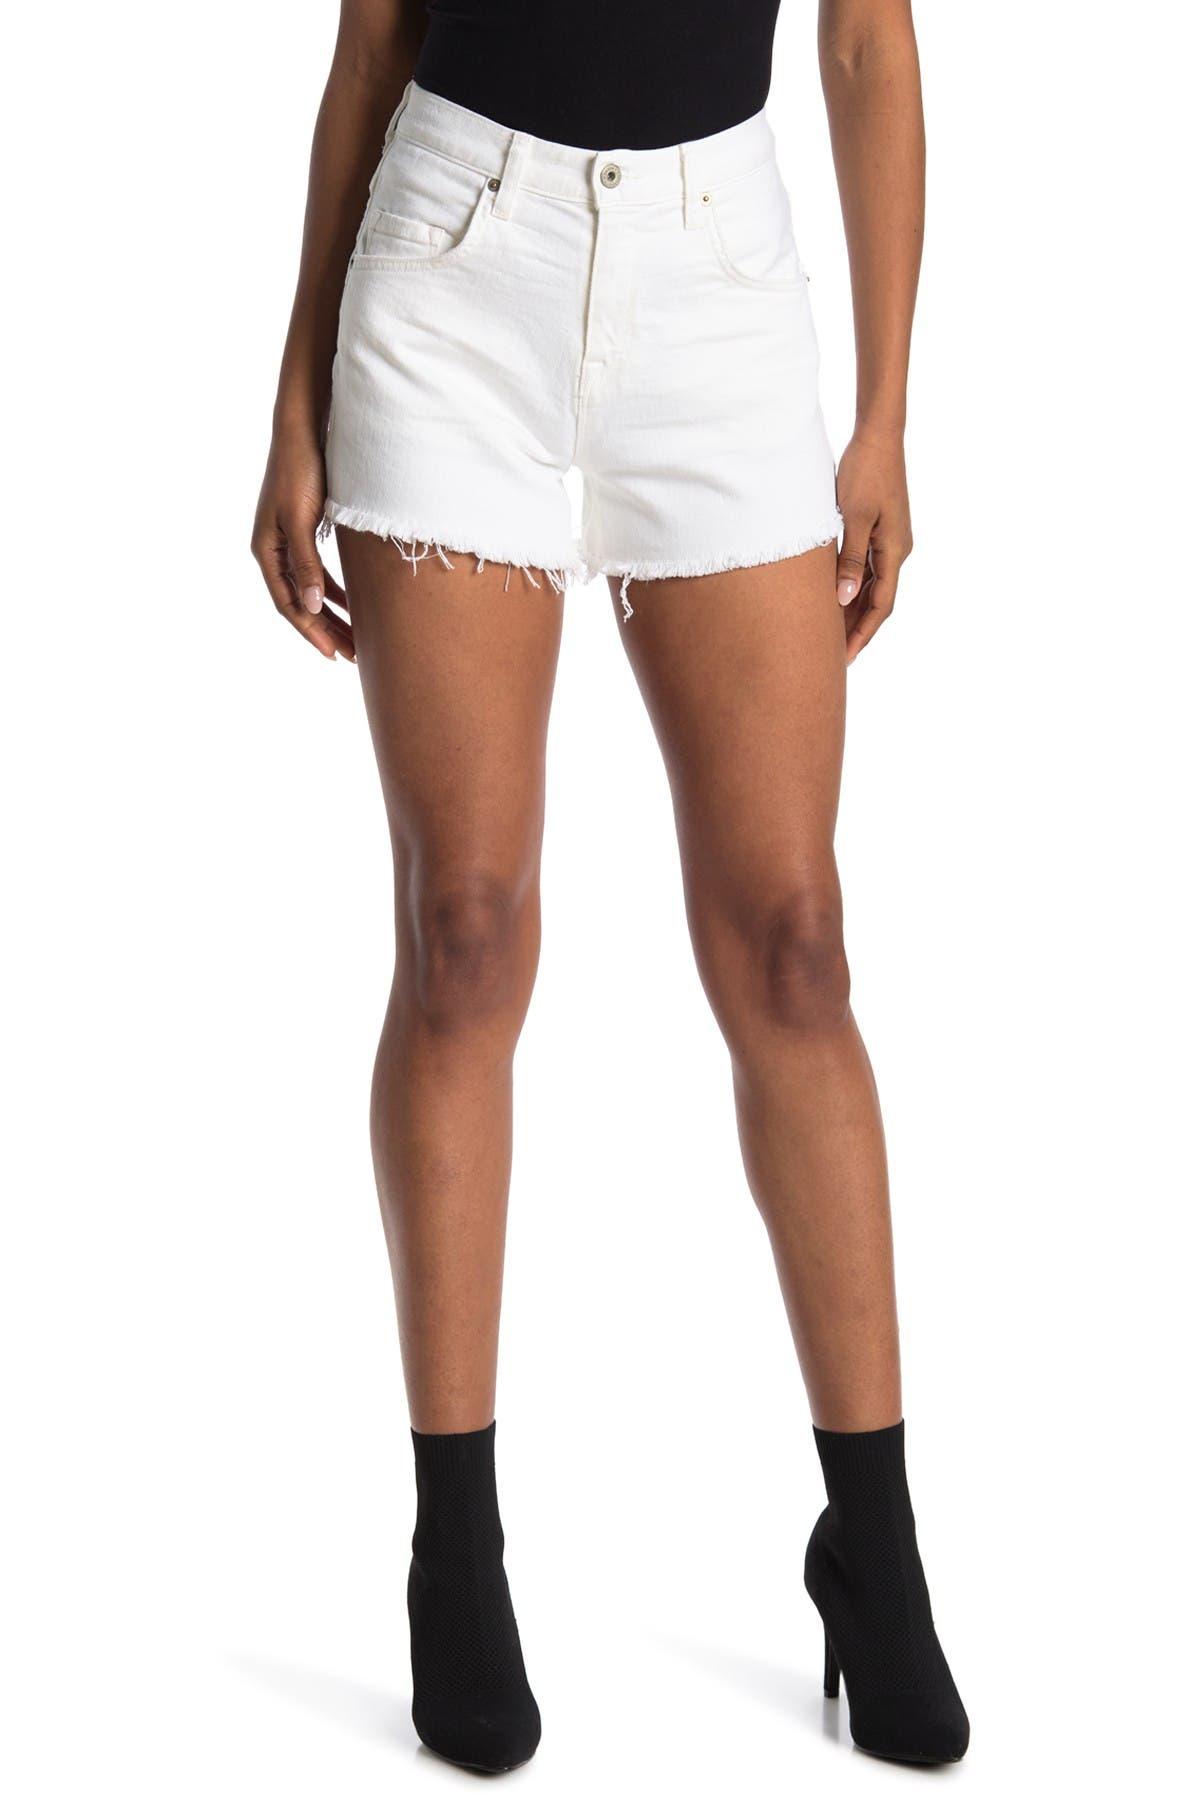 Image of BALDWIN Maddie High Waist Distressed Cut-Off Shorts